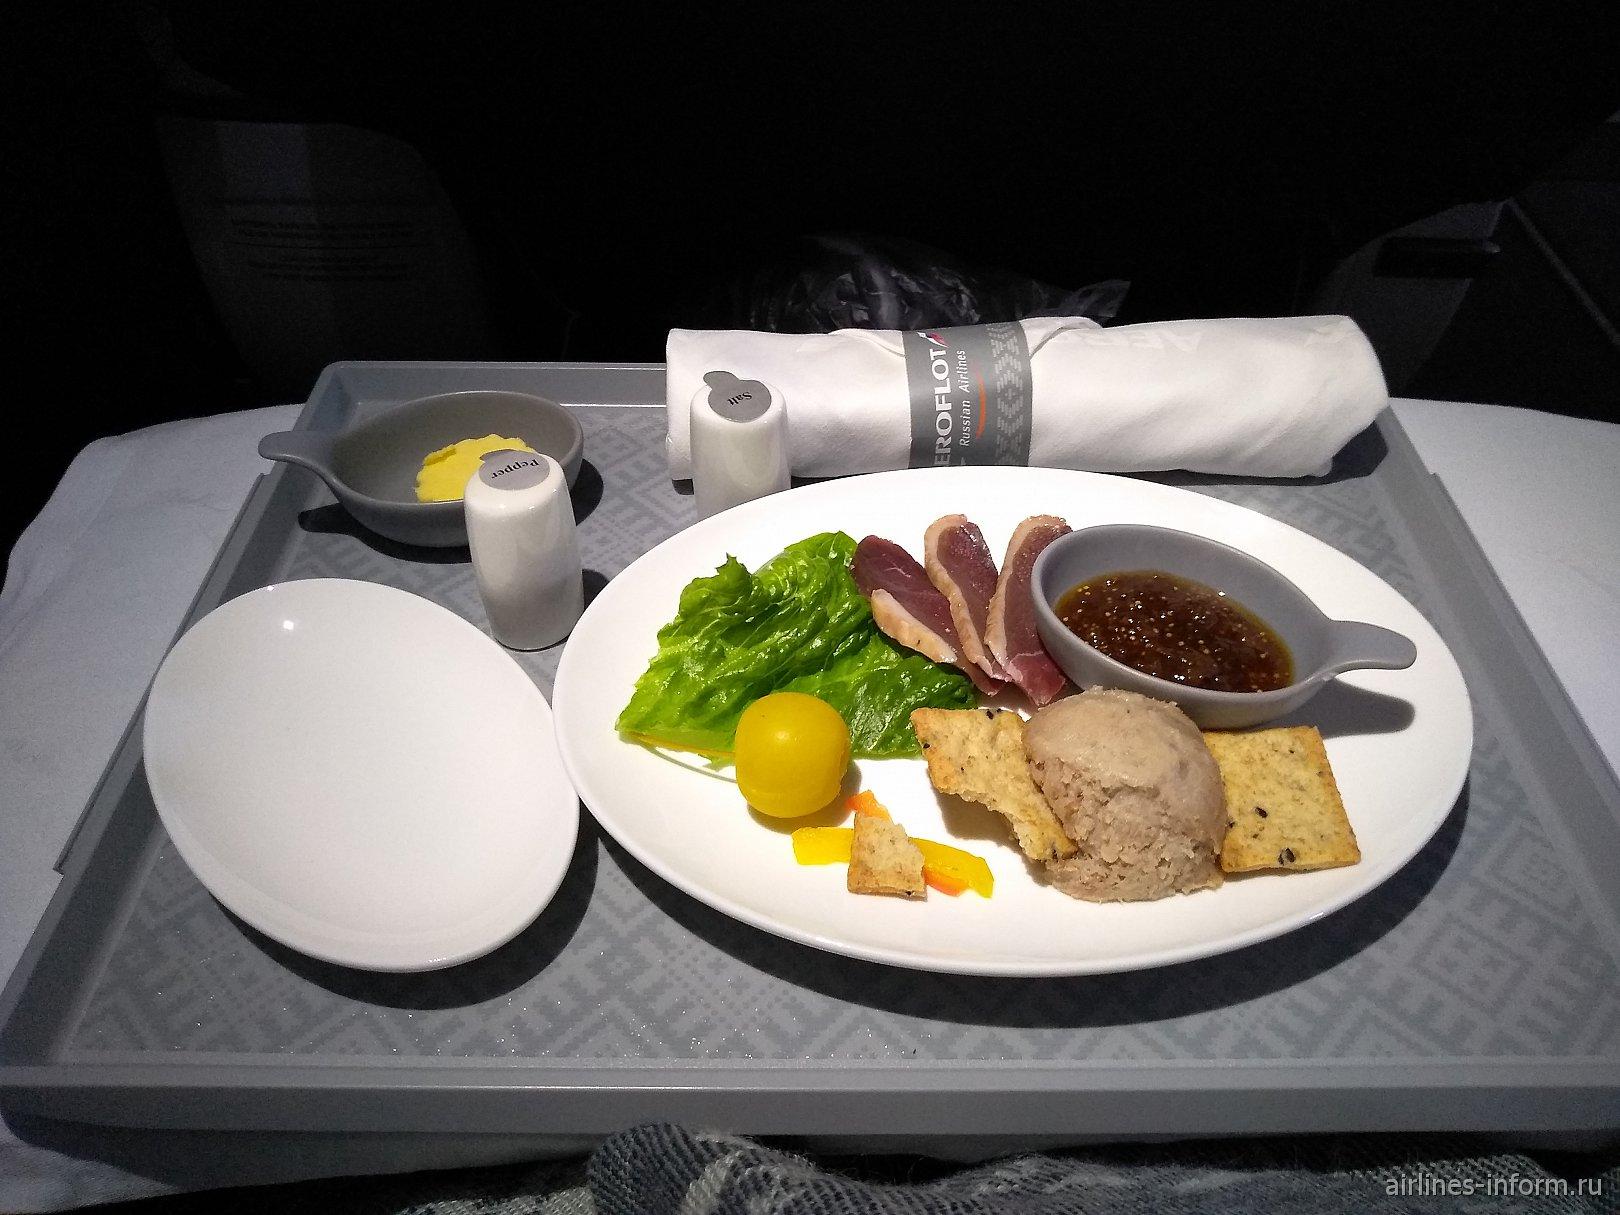 Бортовое питание бизнес-класса на рейсе Барселона-Москва Аэрофлота